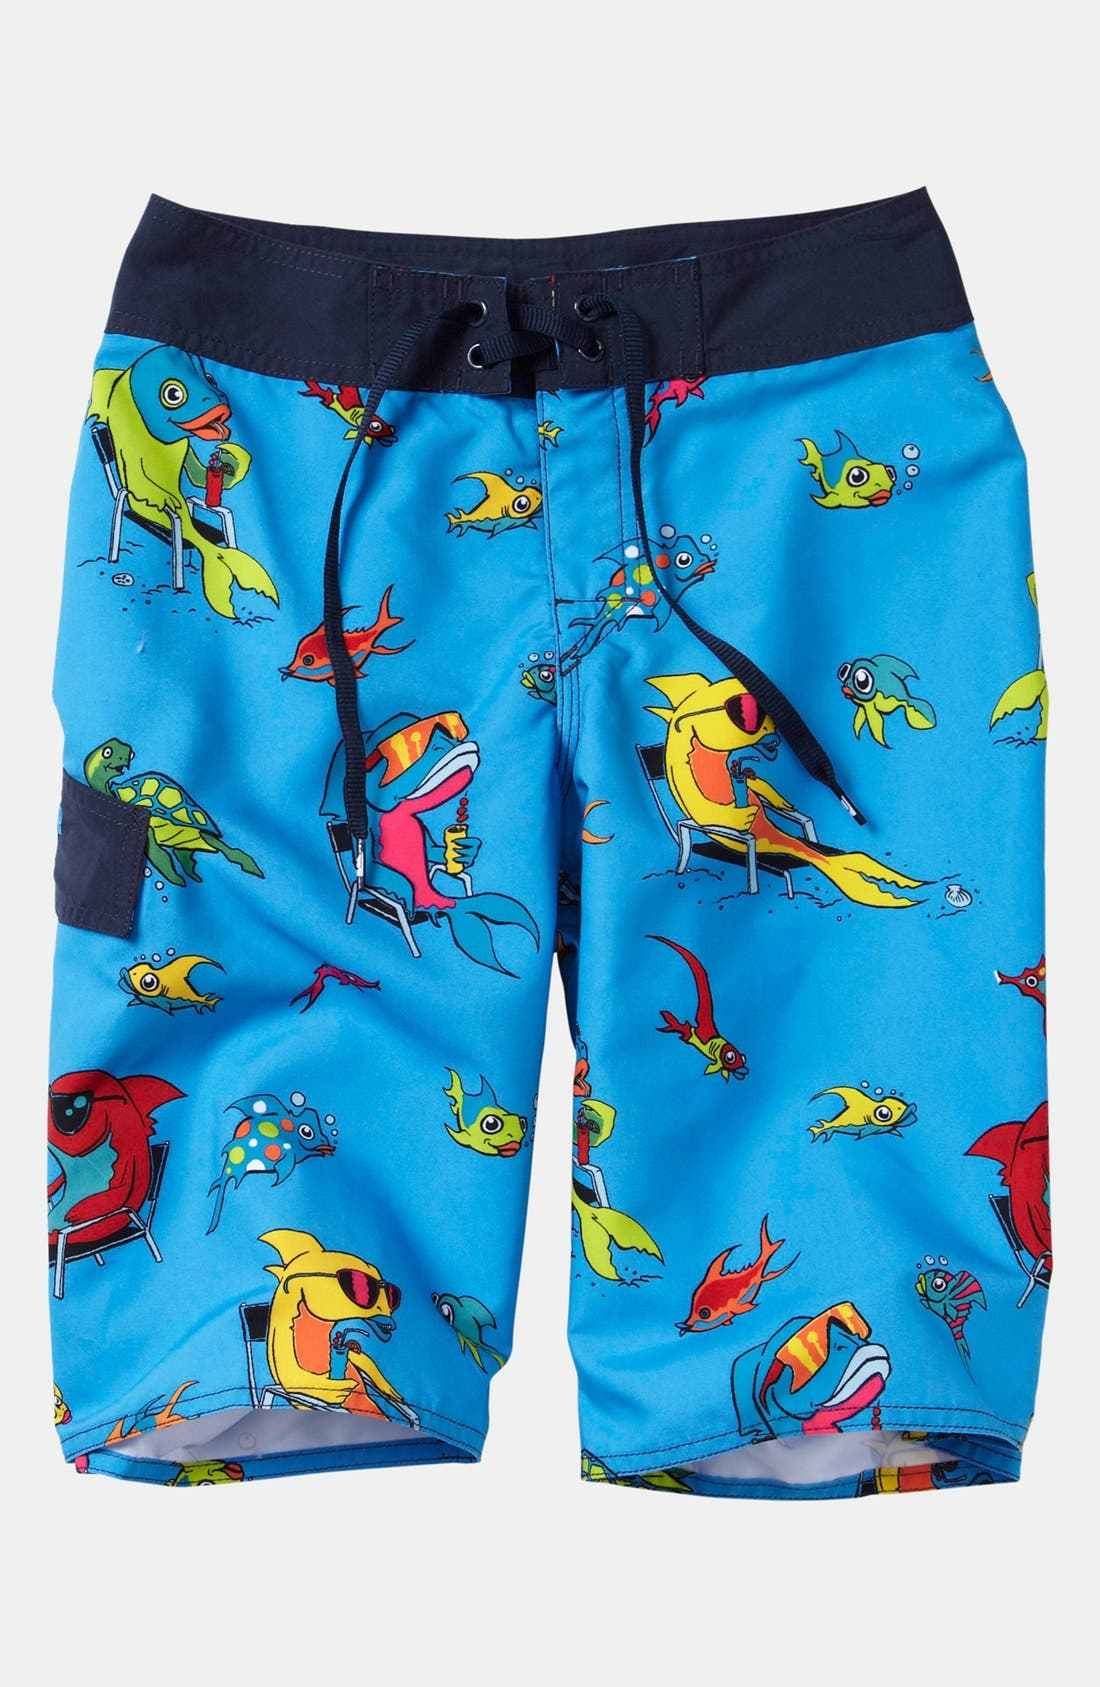 Alternate Image 1 Selected - Quiksilver 'Fish Tacoz' Board Shorts (Big Boys)